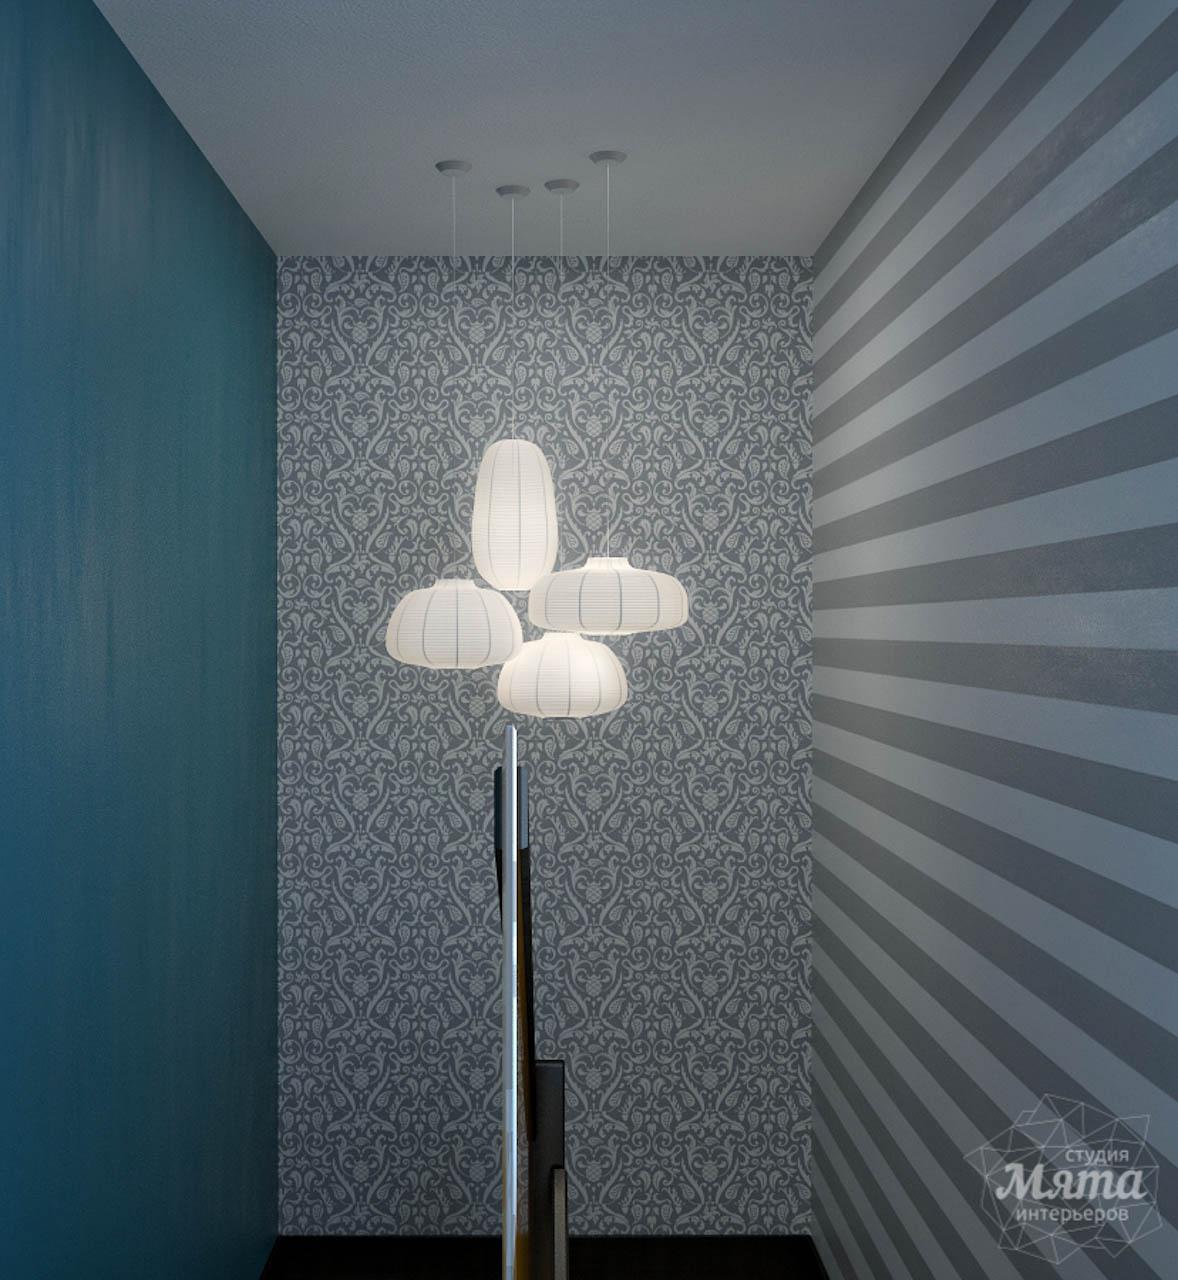 Дизайн проект интерьера коттеджа  в стиле минимализм по ул. Барвинка 15 img2049667881